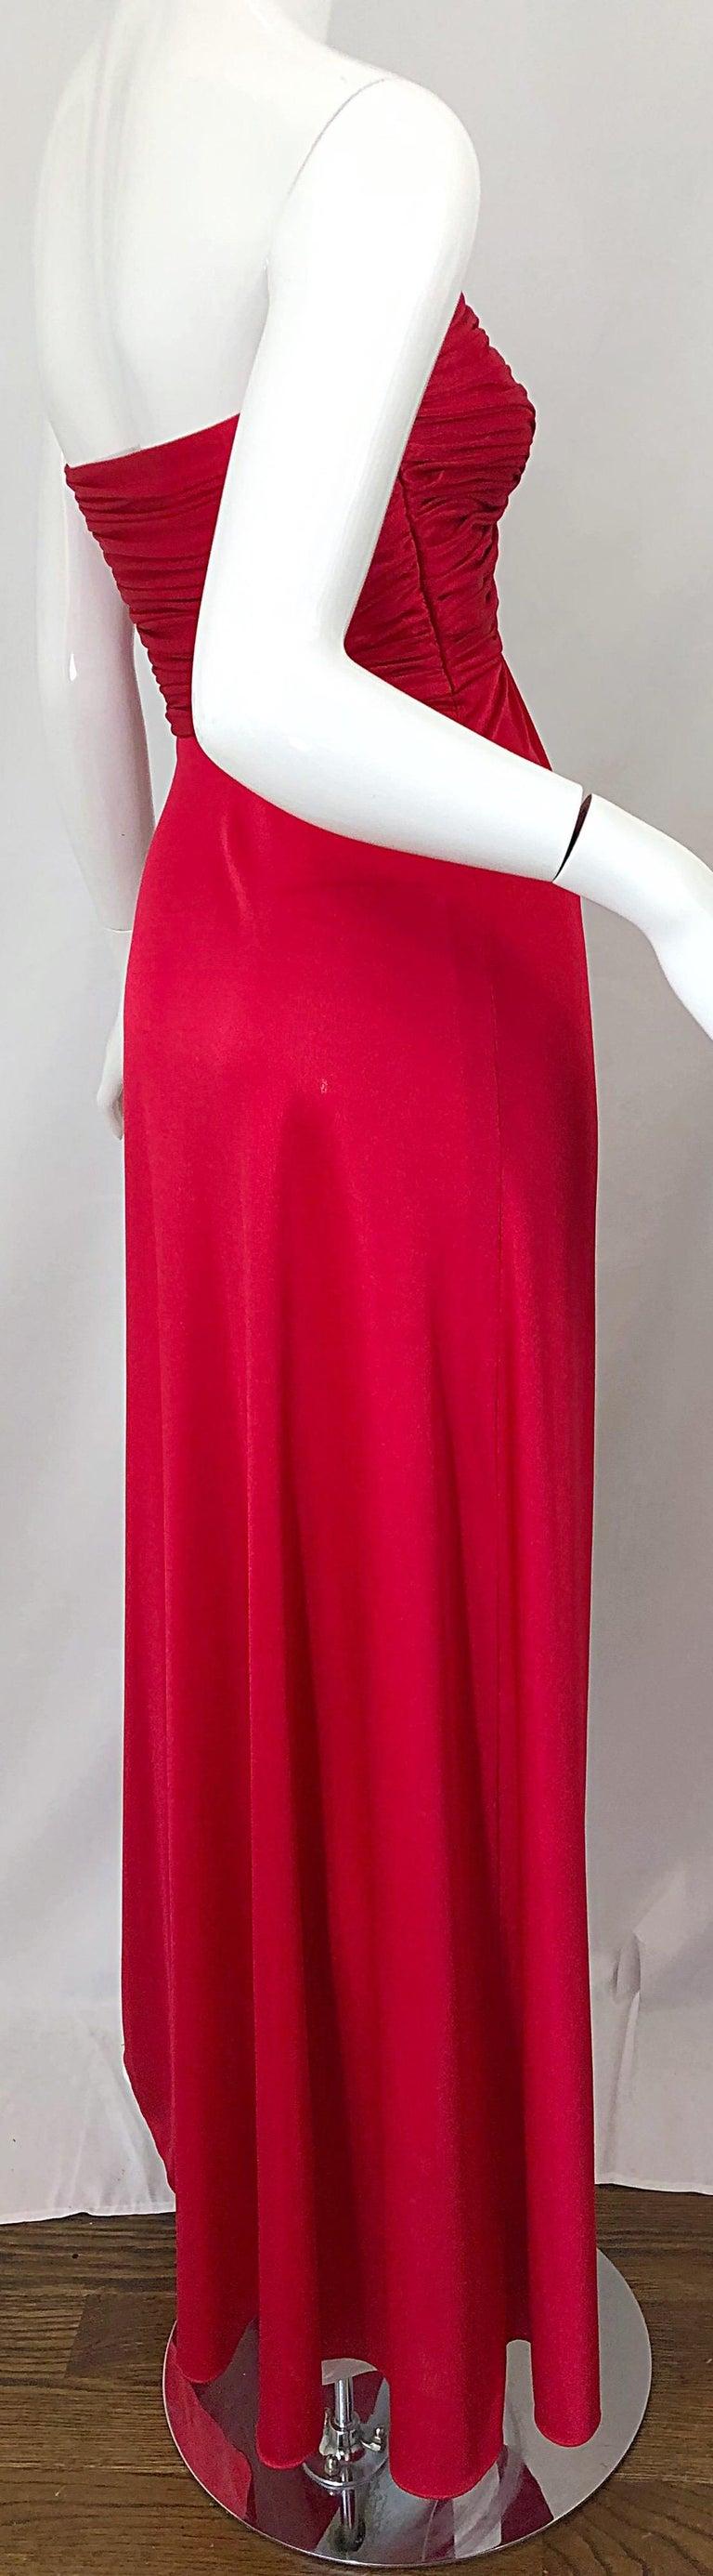 1970s Luis Estevez Silk Jersey Lipstick Red Strapless Vintage 70s Grecian Gown For Sale 2